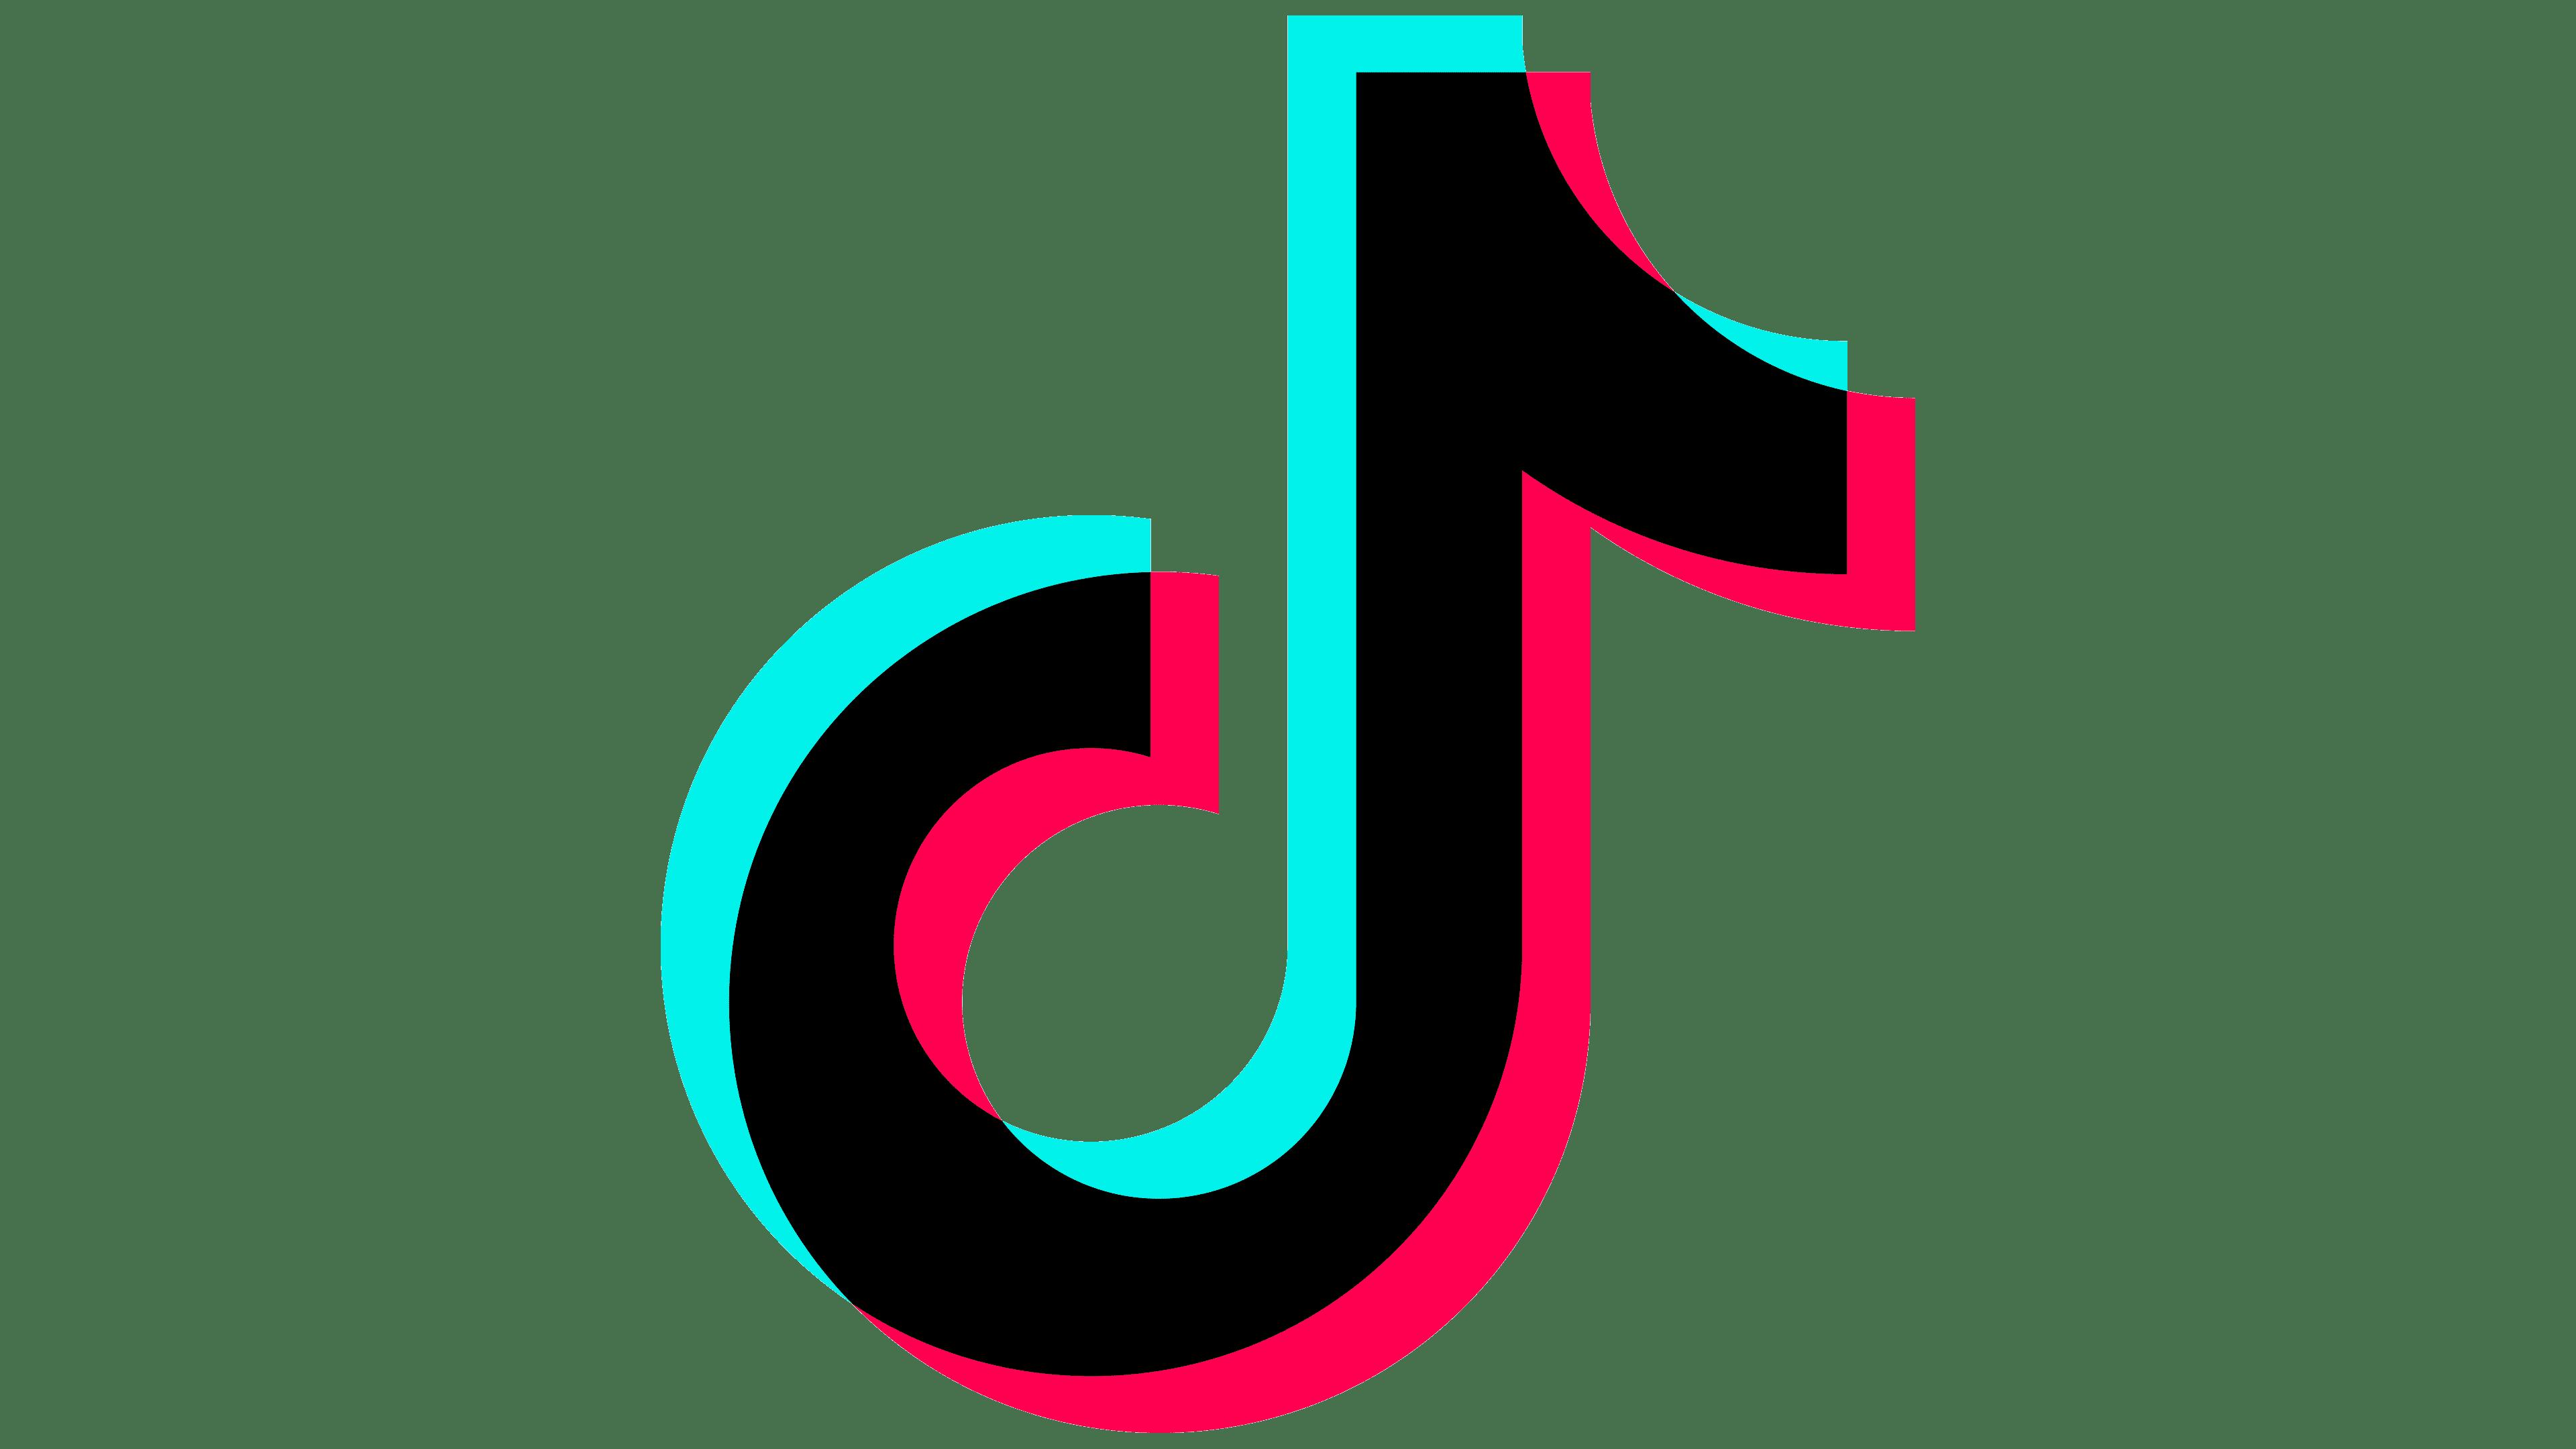 TikTok Logo | Symbol, History, PNG (3840*2160)